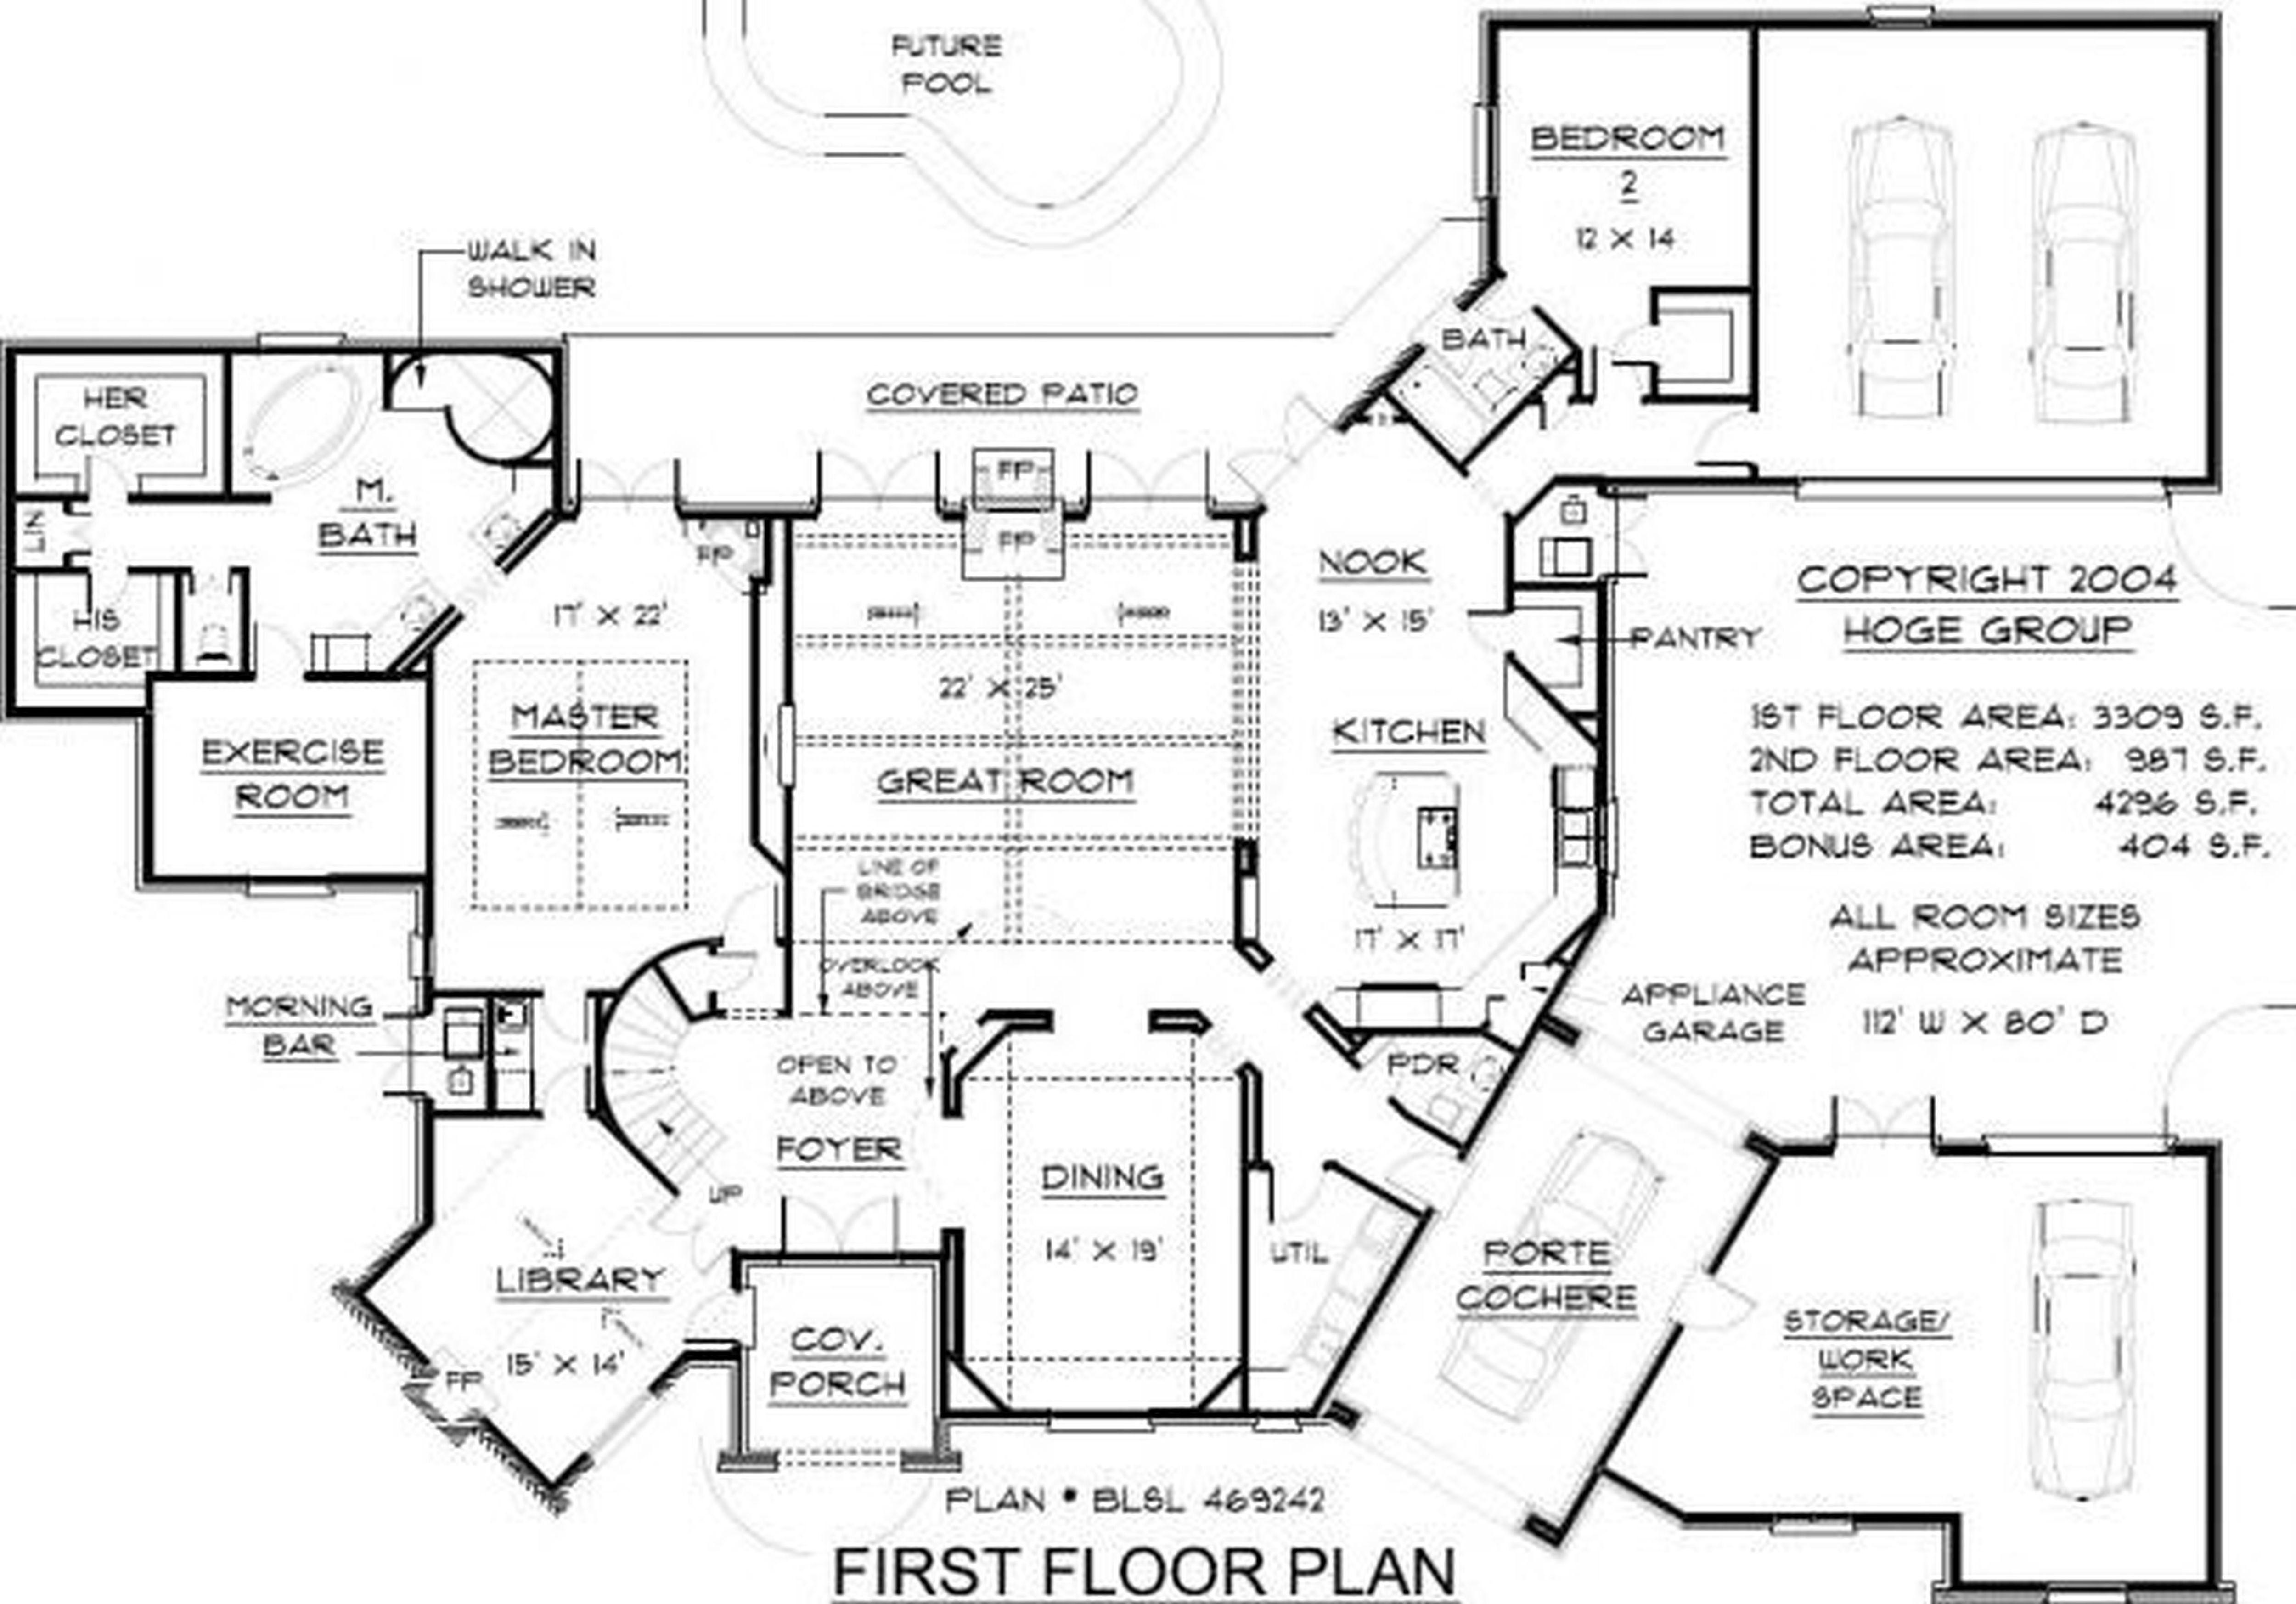 Good small house floor plans cottage amazing pictures grafikdede com - Marvelous Create House Floor Plans Free Good Looking Grafikdede Online Woodworker Magazine